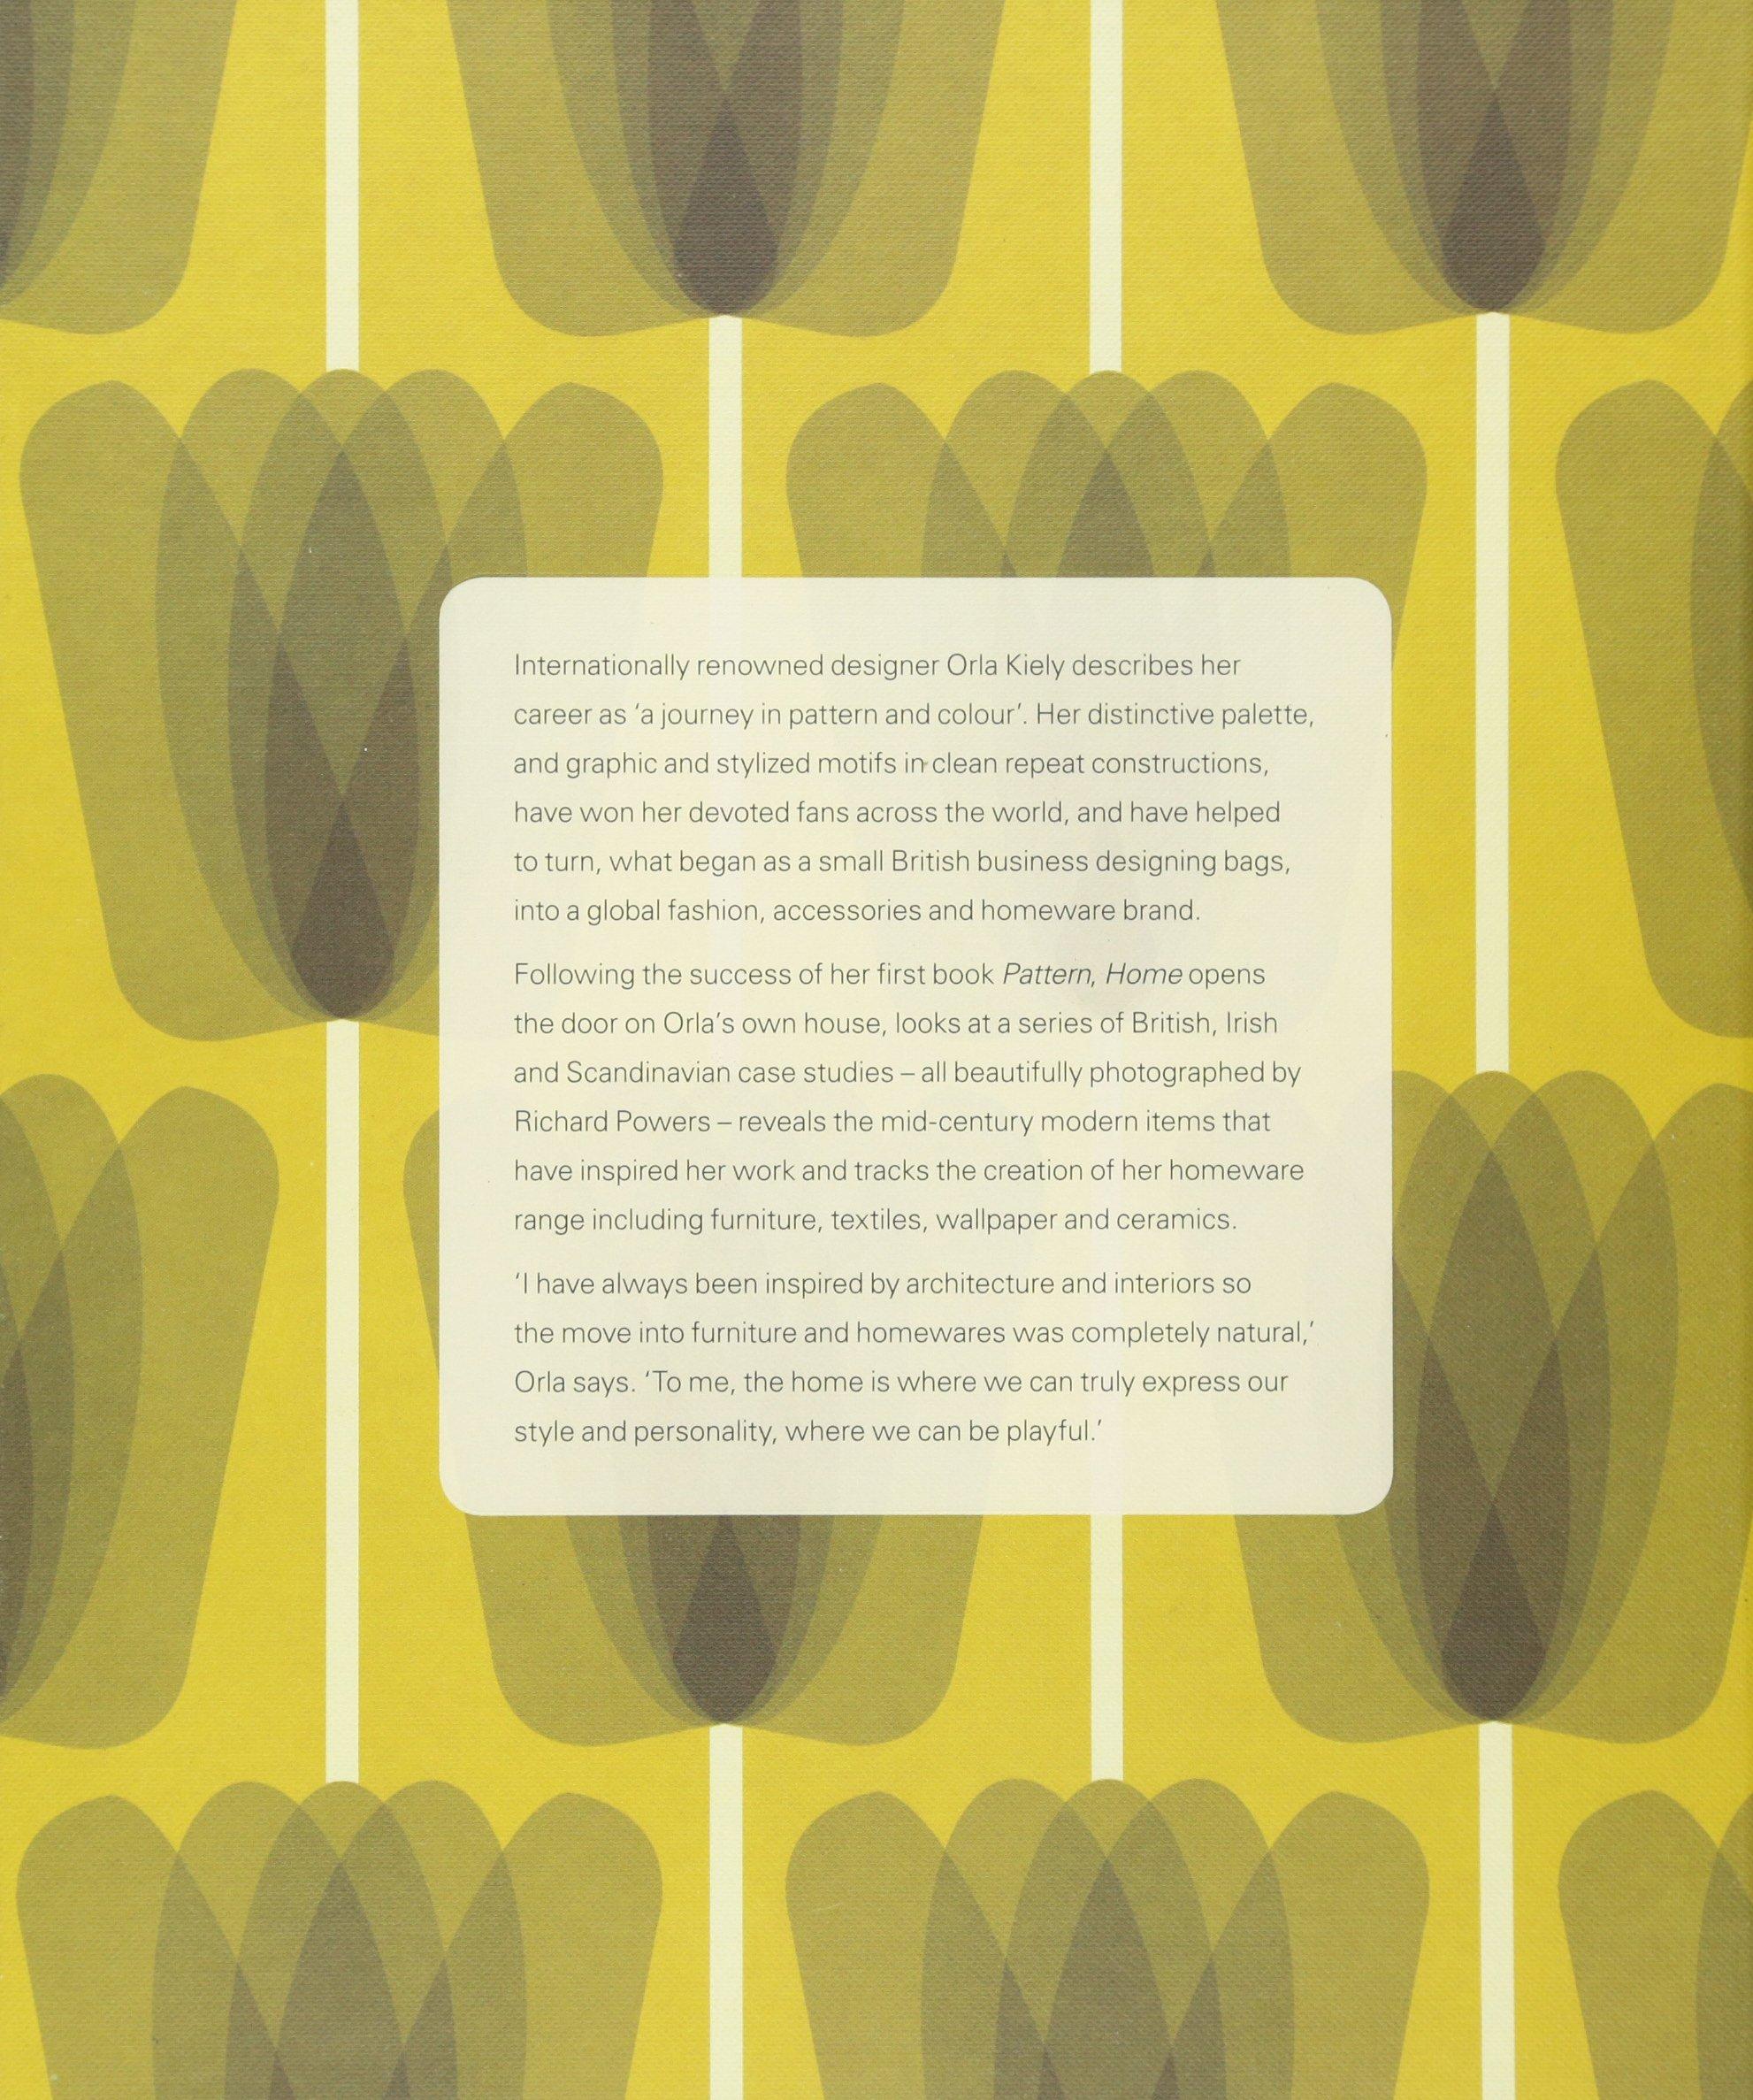 Orla Kiely Home: Amazon.co.uk: Orla Kiely: Books